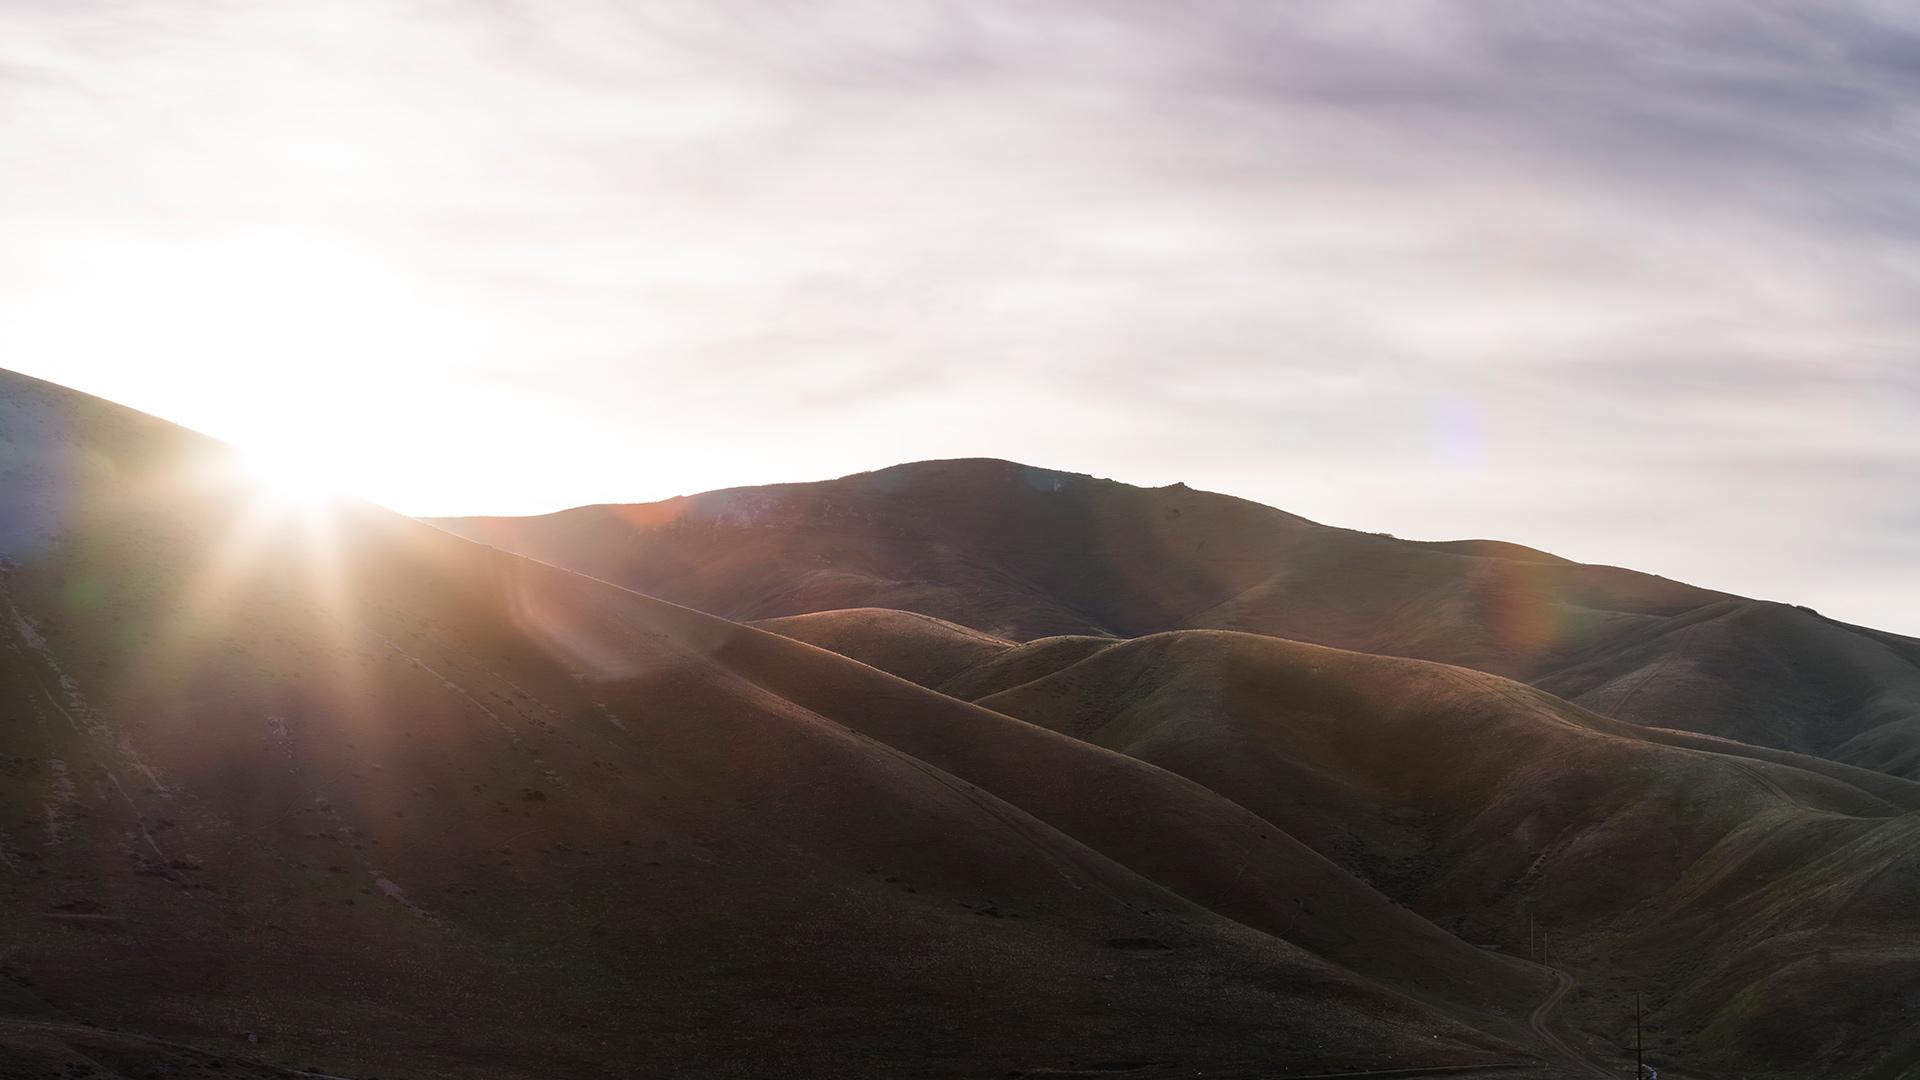 Beautiful mountain views throughout the community